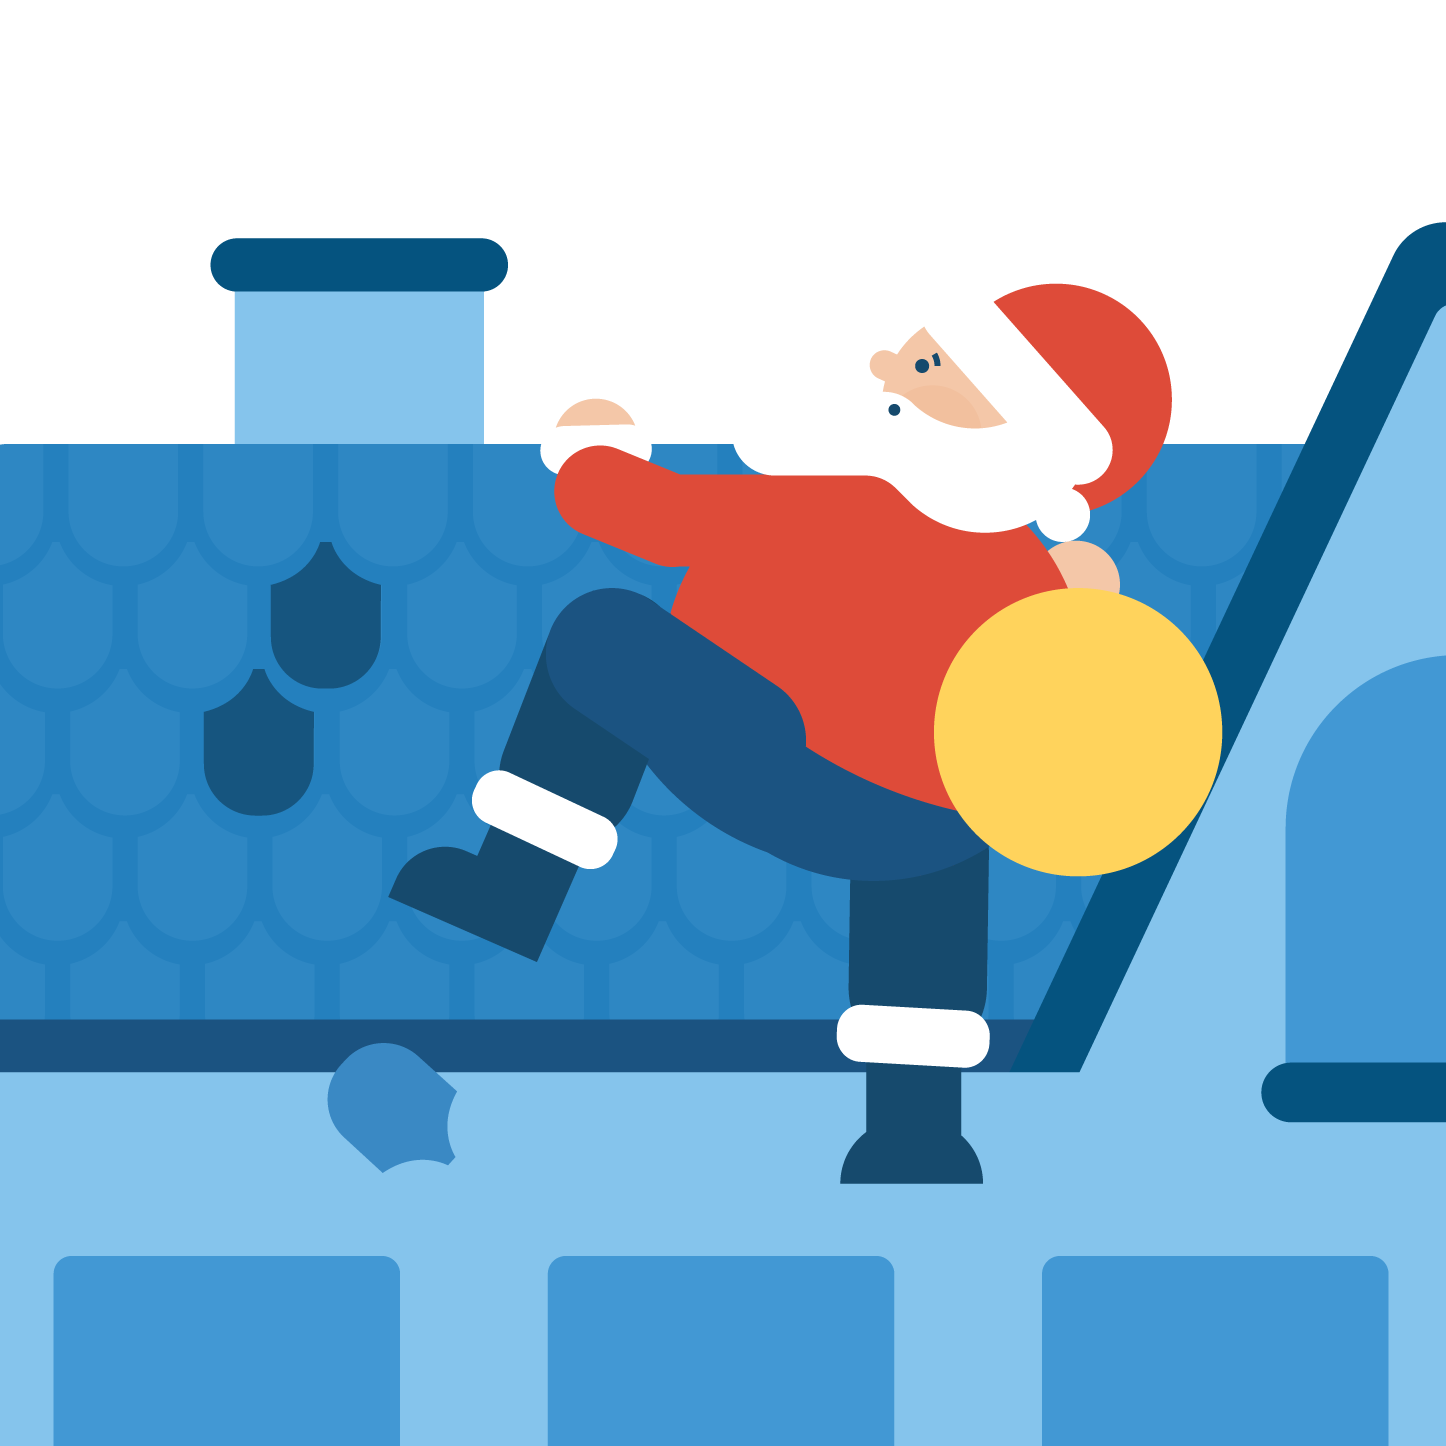 Santa climbing a roof